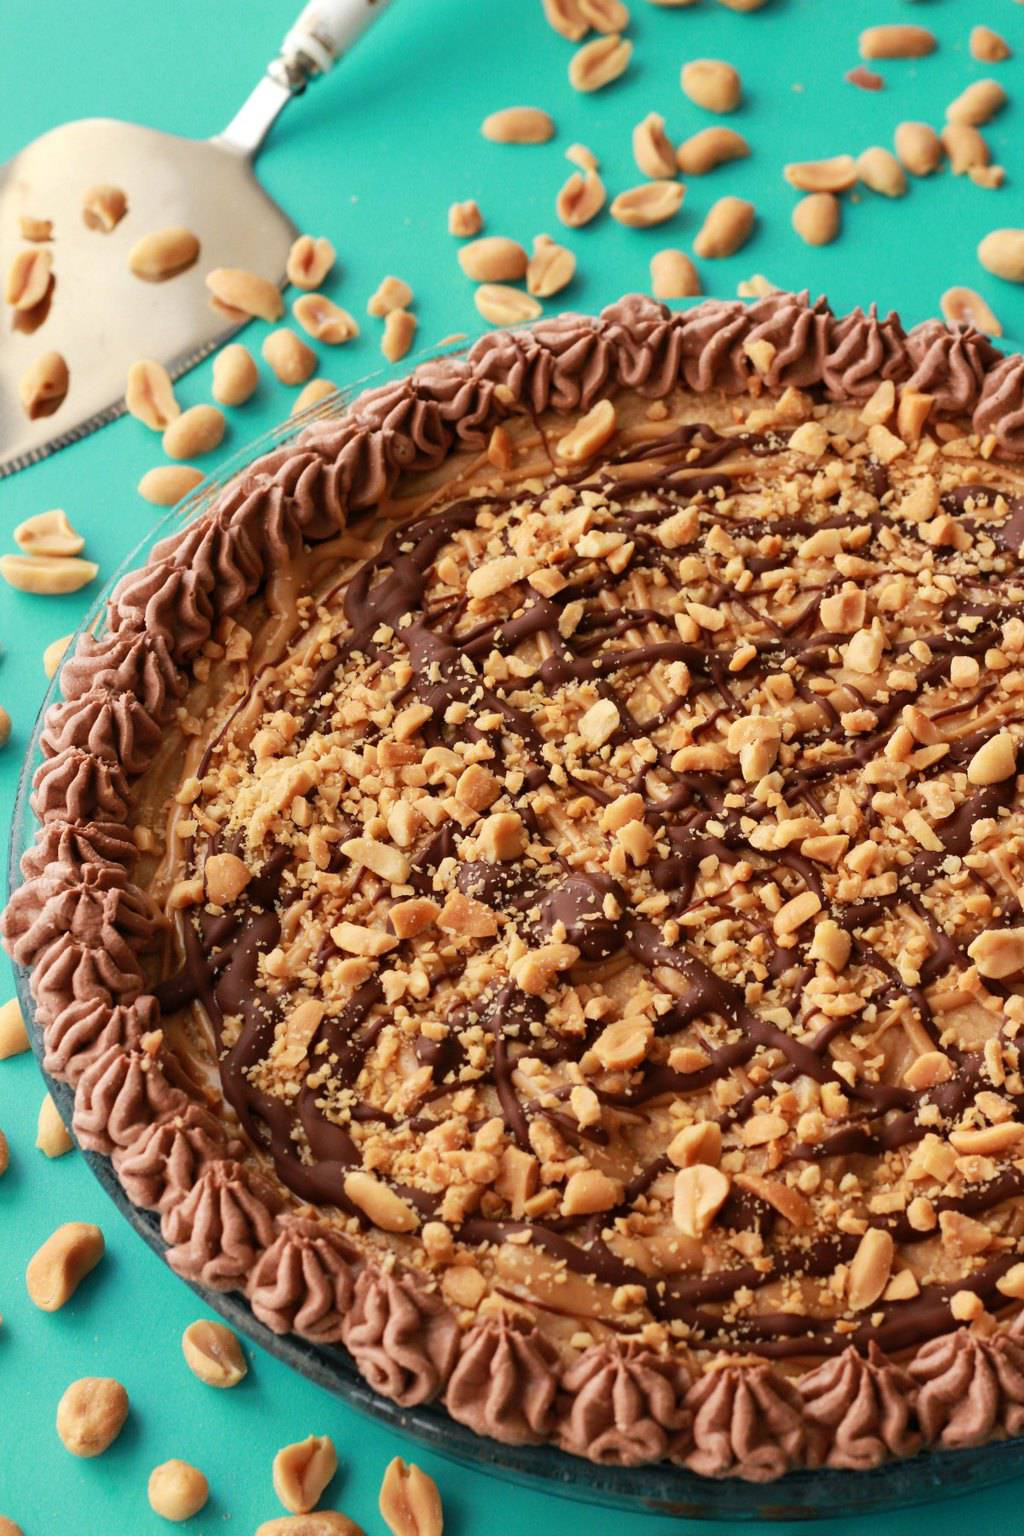 Vegan Peanut Butter Pie. Purely irresistible no-bake vegan pie with an oreo cookie crust, creamy peanut butter filling and drizzled peanut butter and chocolate topping! #vegan #lovingitvegan #dessert #peanutbutterpie #dairyfree